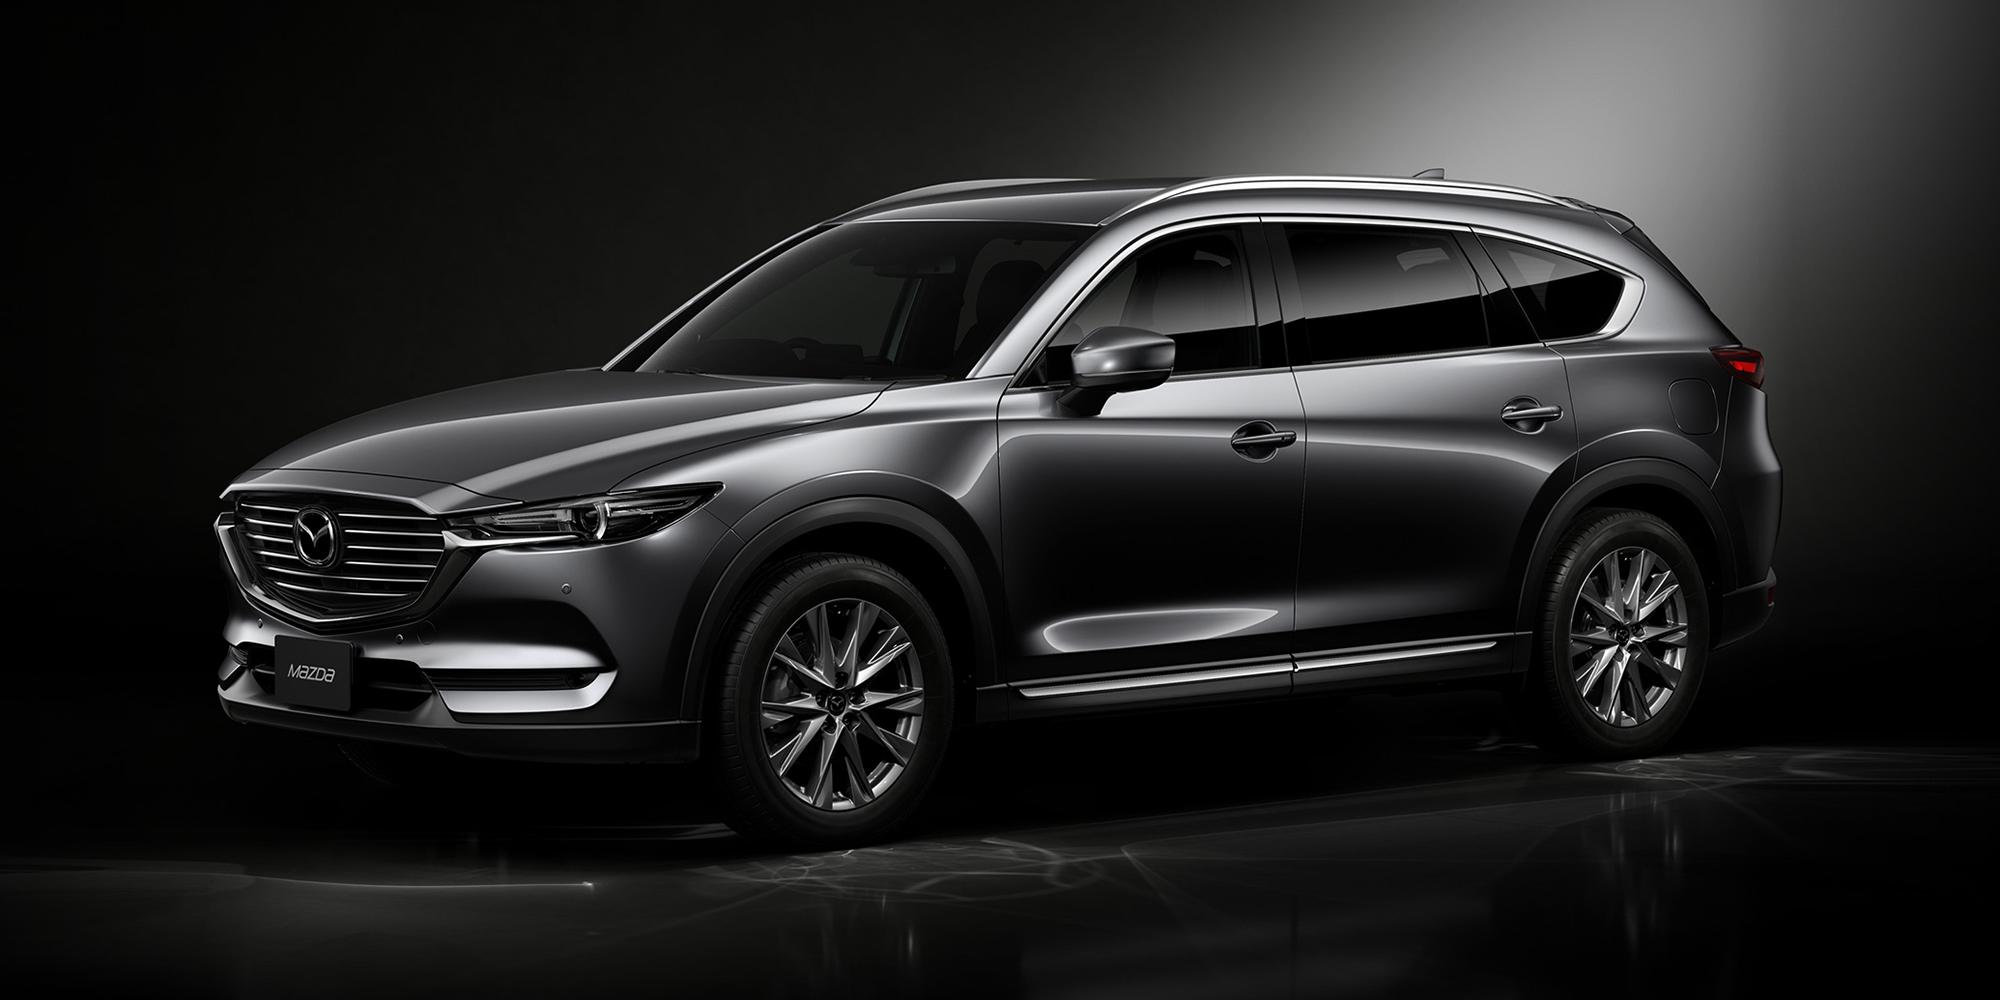 Nissan Navara Suv 2017 >> 2018 Mazda CX-8 revealed in Japan - photos   CarAdvice